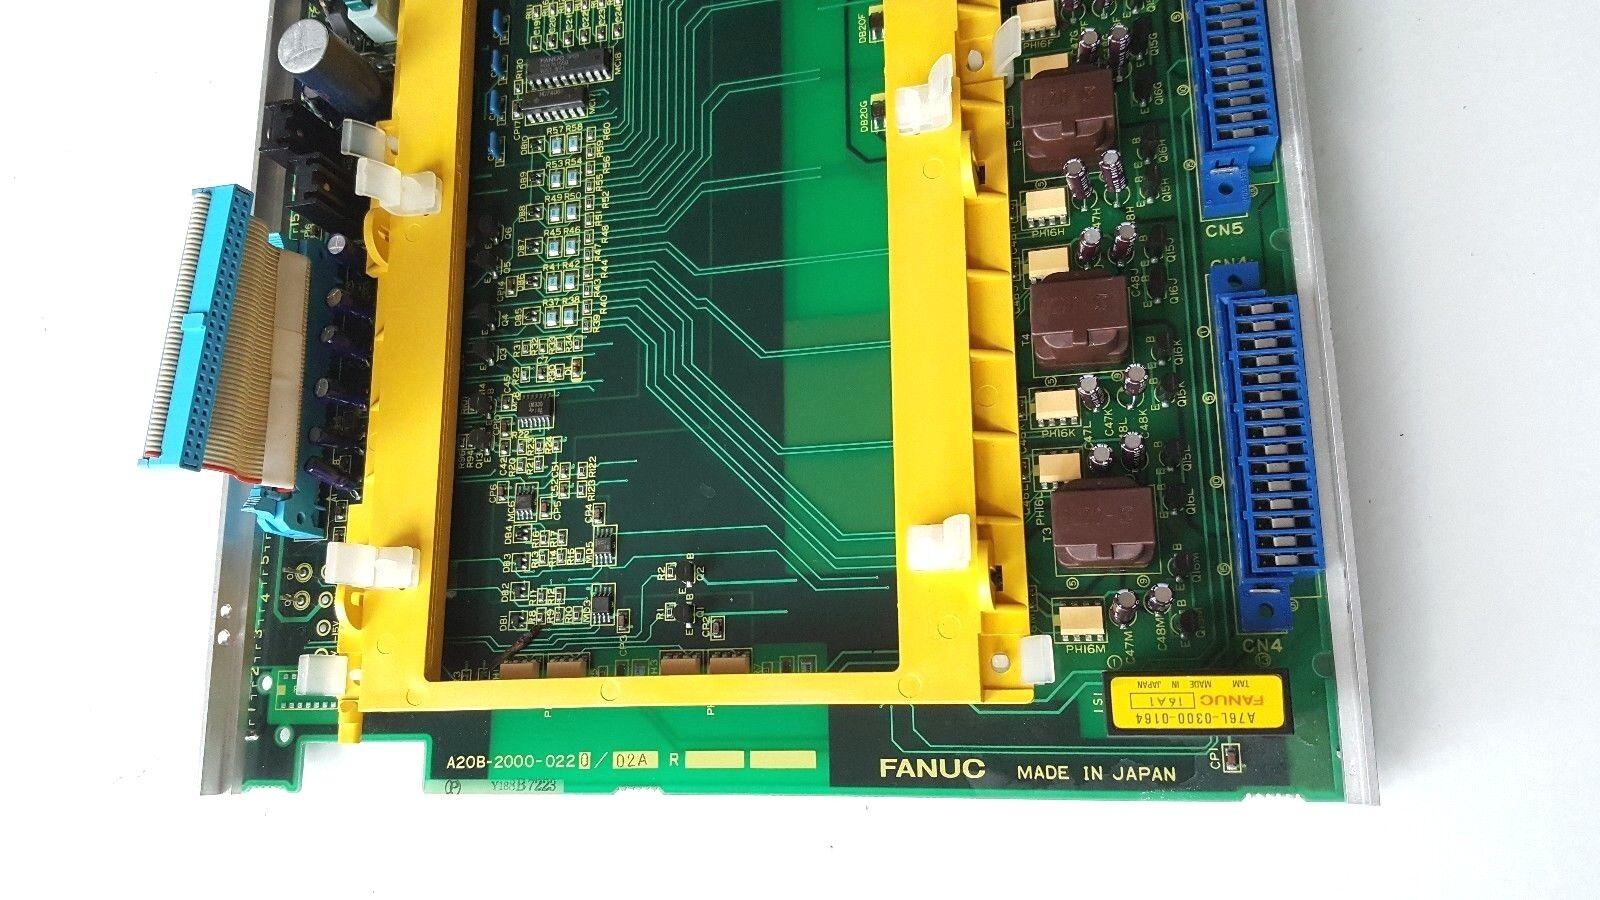 Fanuc A20b 2000 0220 02a Servo Pcp Board Pzo Ebay Prototype Pcb Printed Circuit Breadboard Protoboard 1200 Points Norton Secured Powered By Verisign